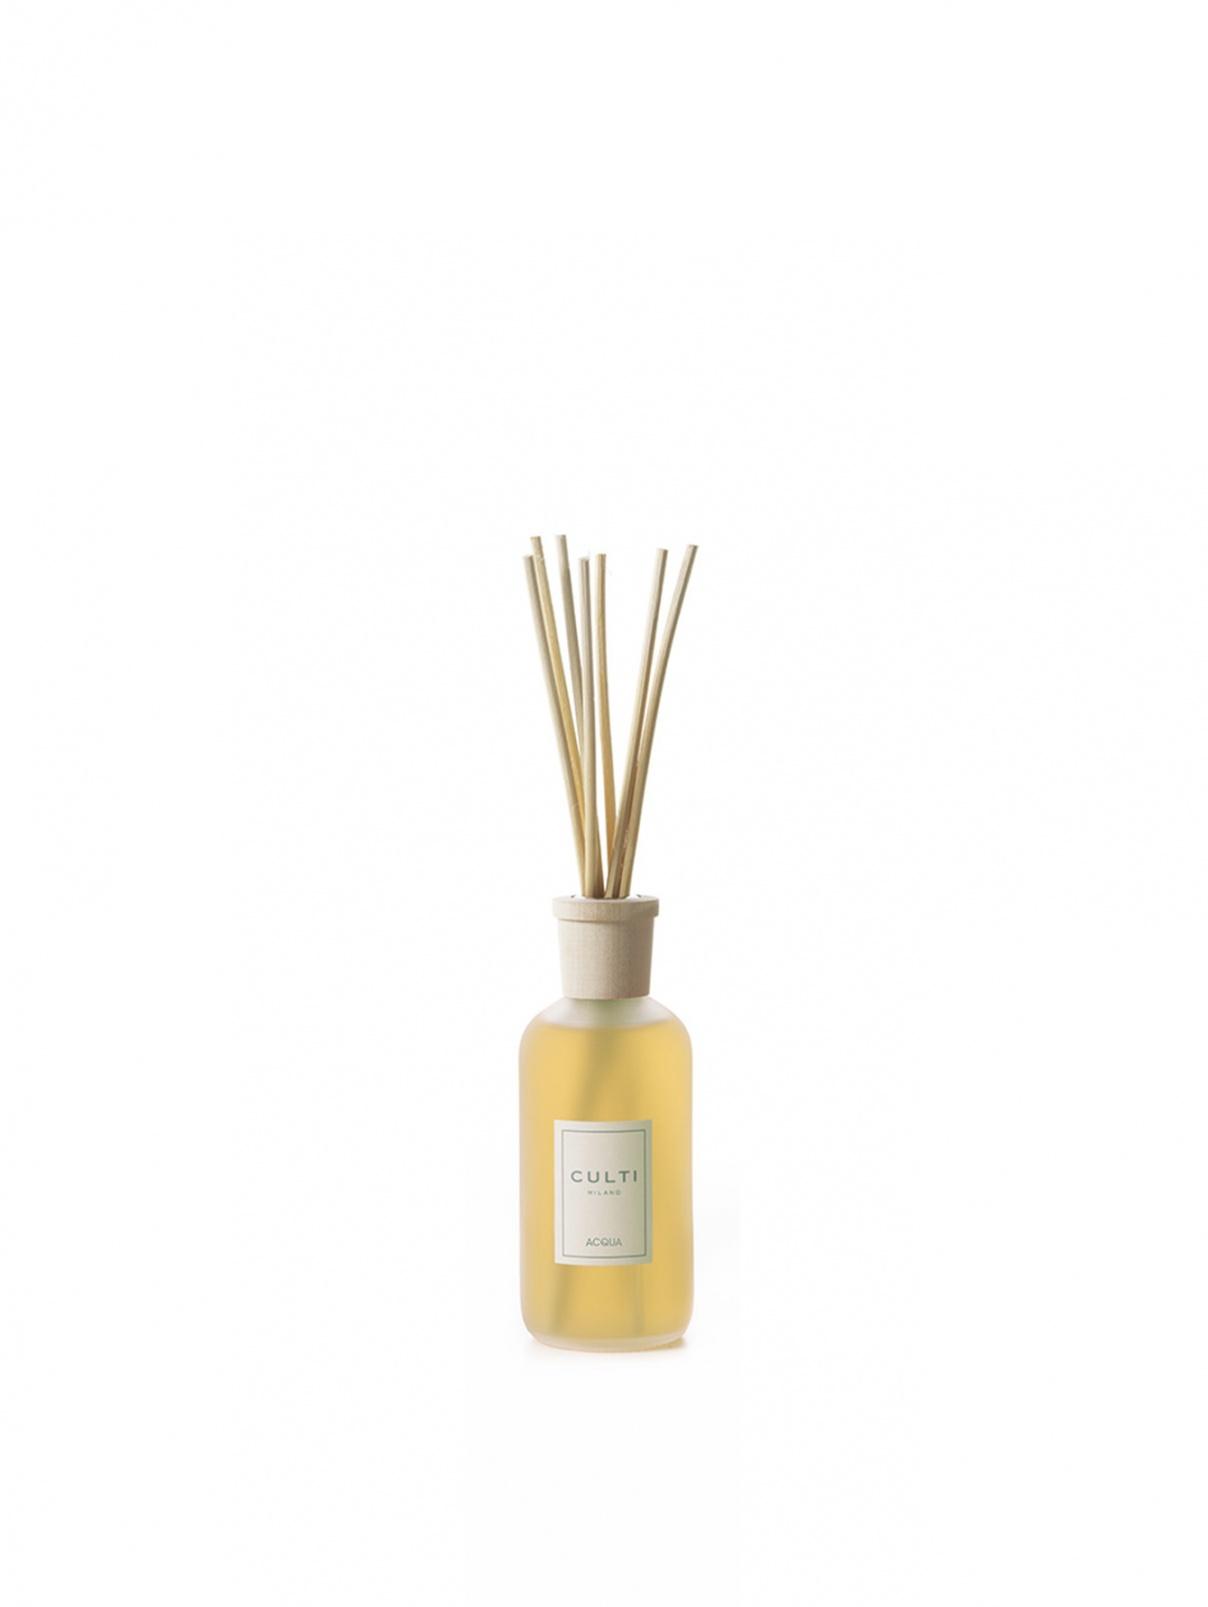 Stile Classic диффузор Acqua 250 мл Home Fragrance Culti Milano  –  Общий вид